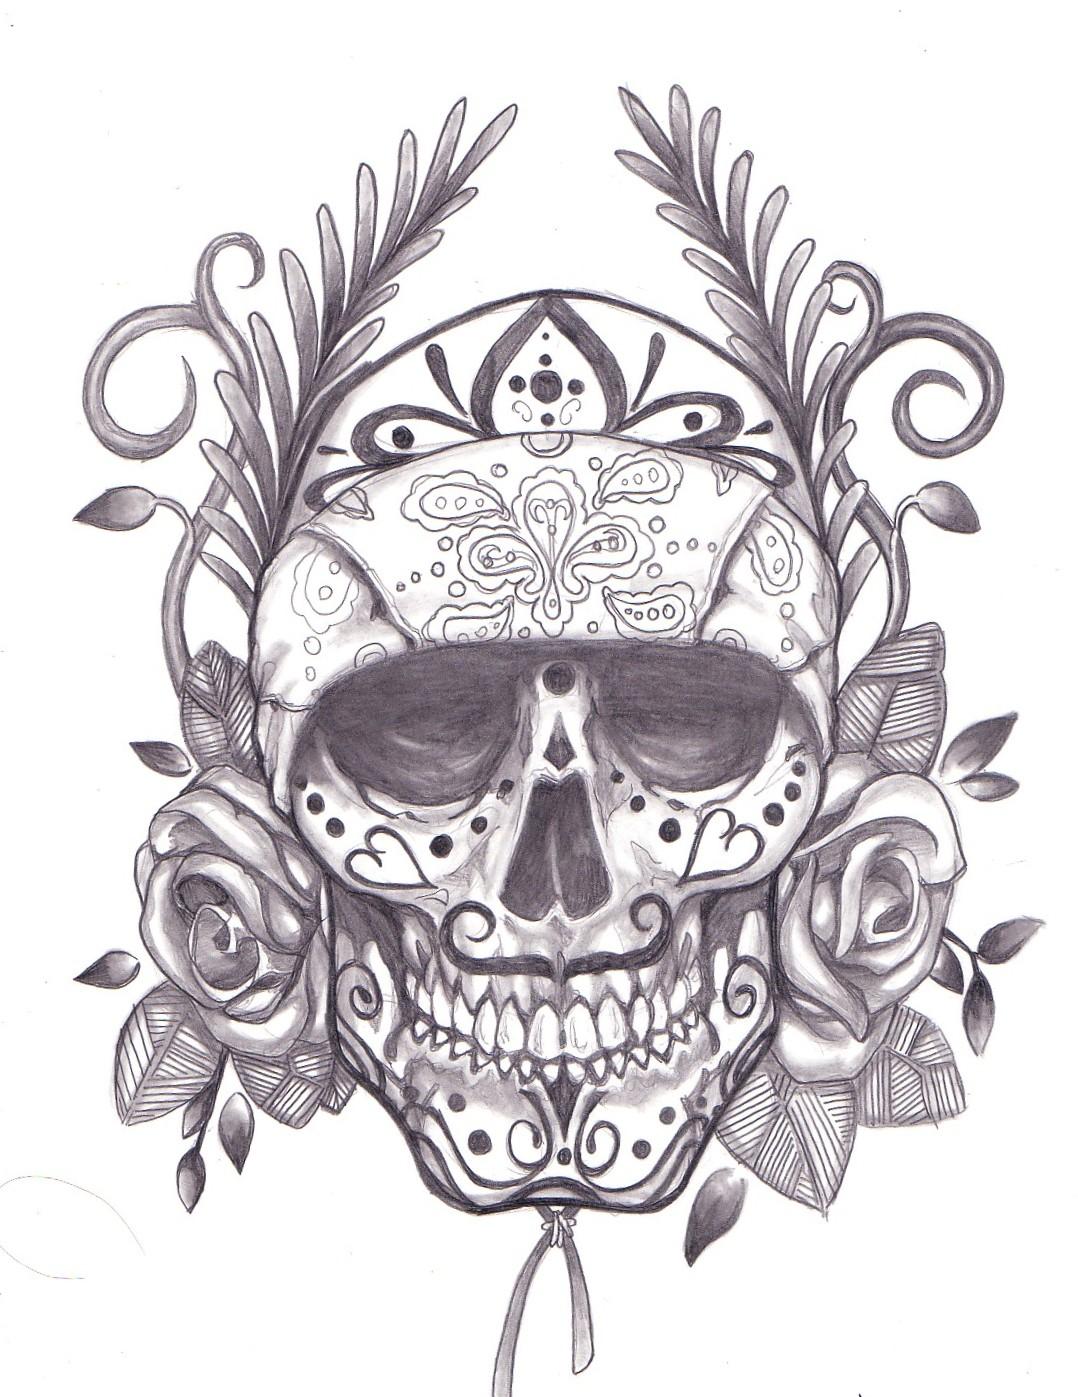 Another Sugar Skull Drawing